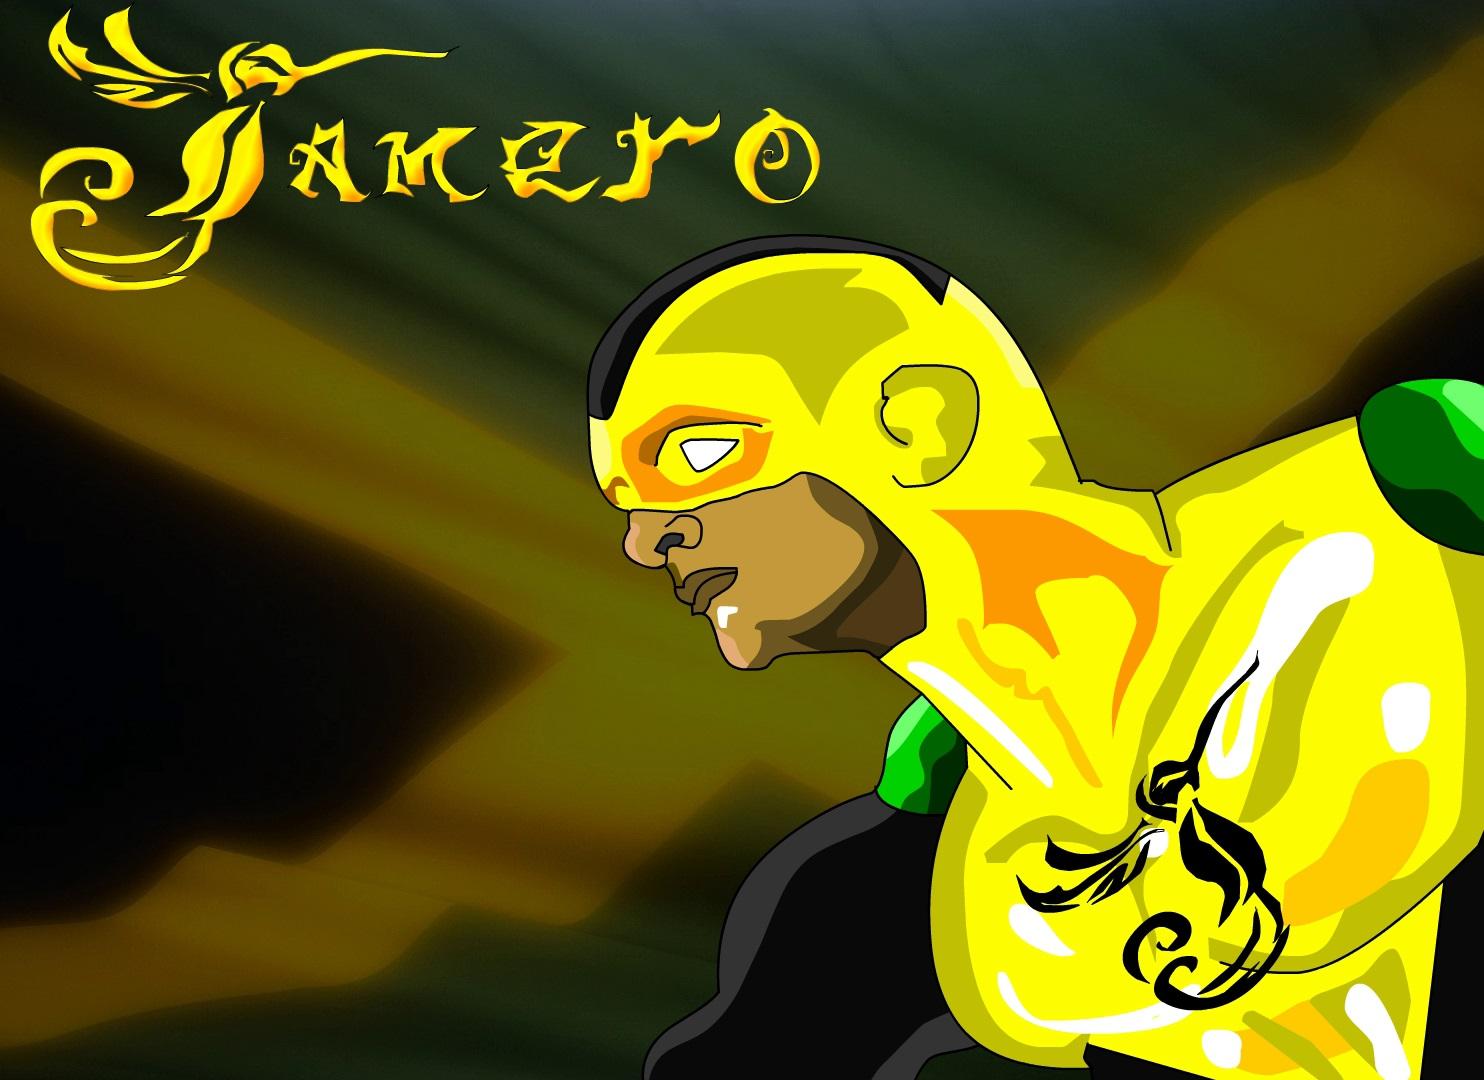 Jamero 3